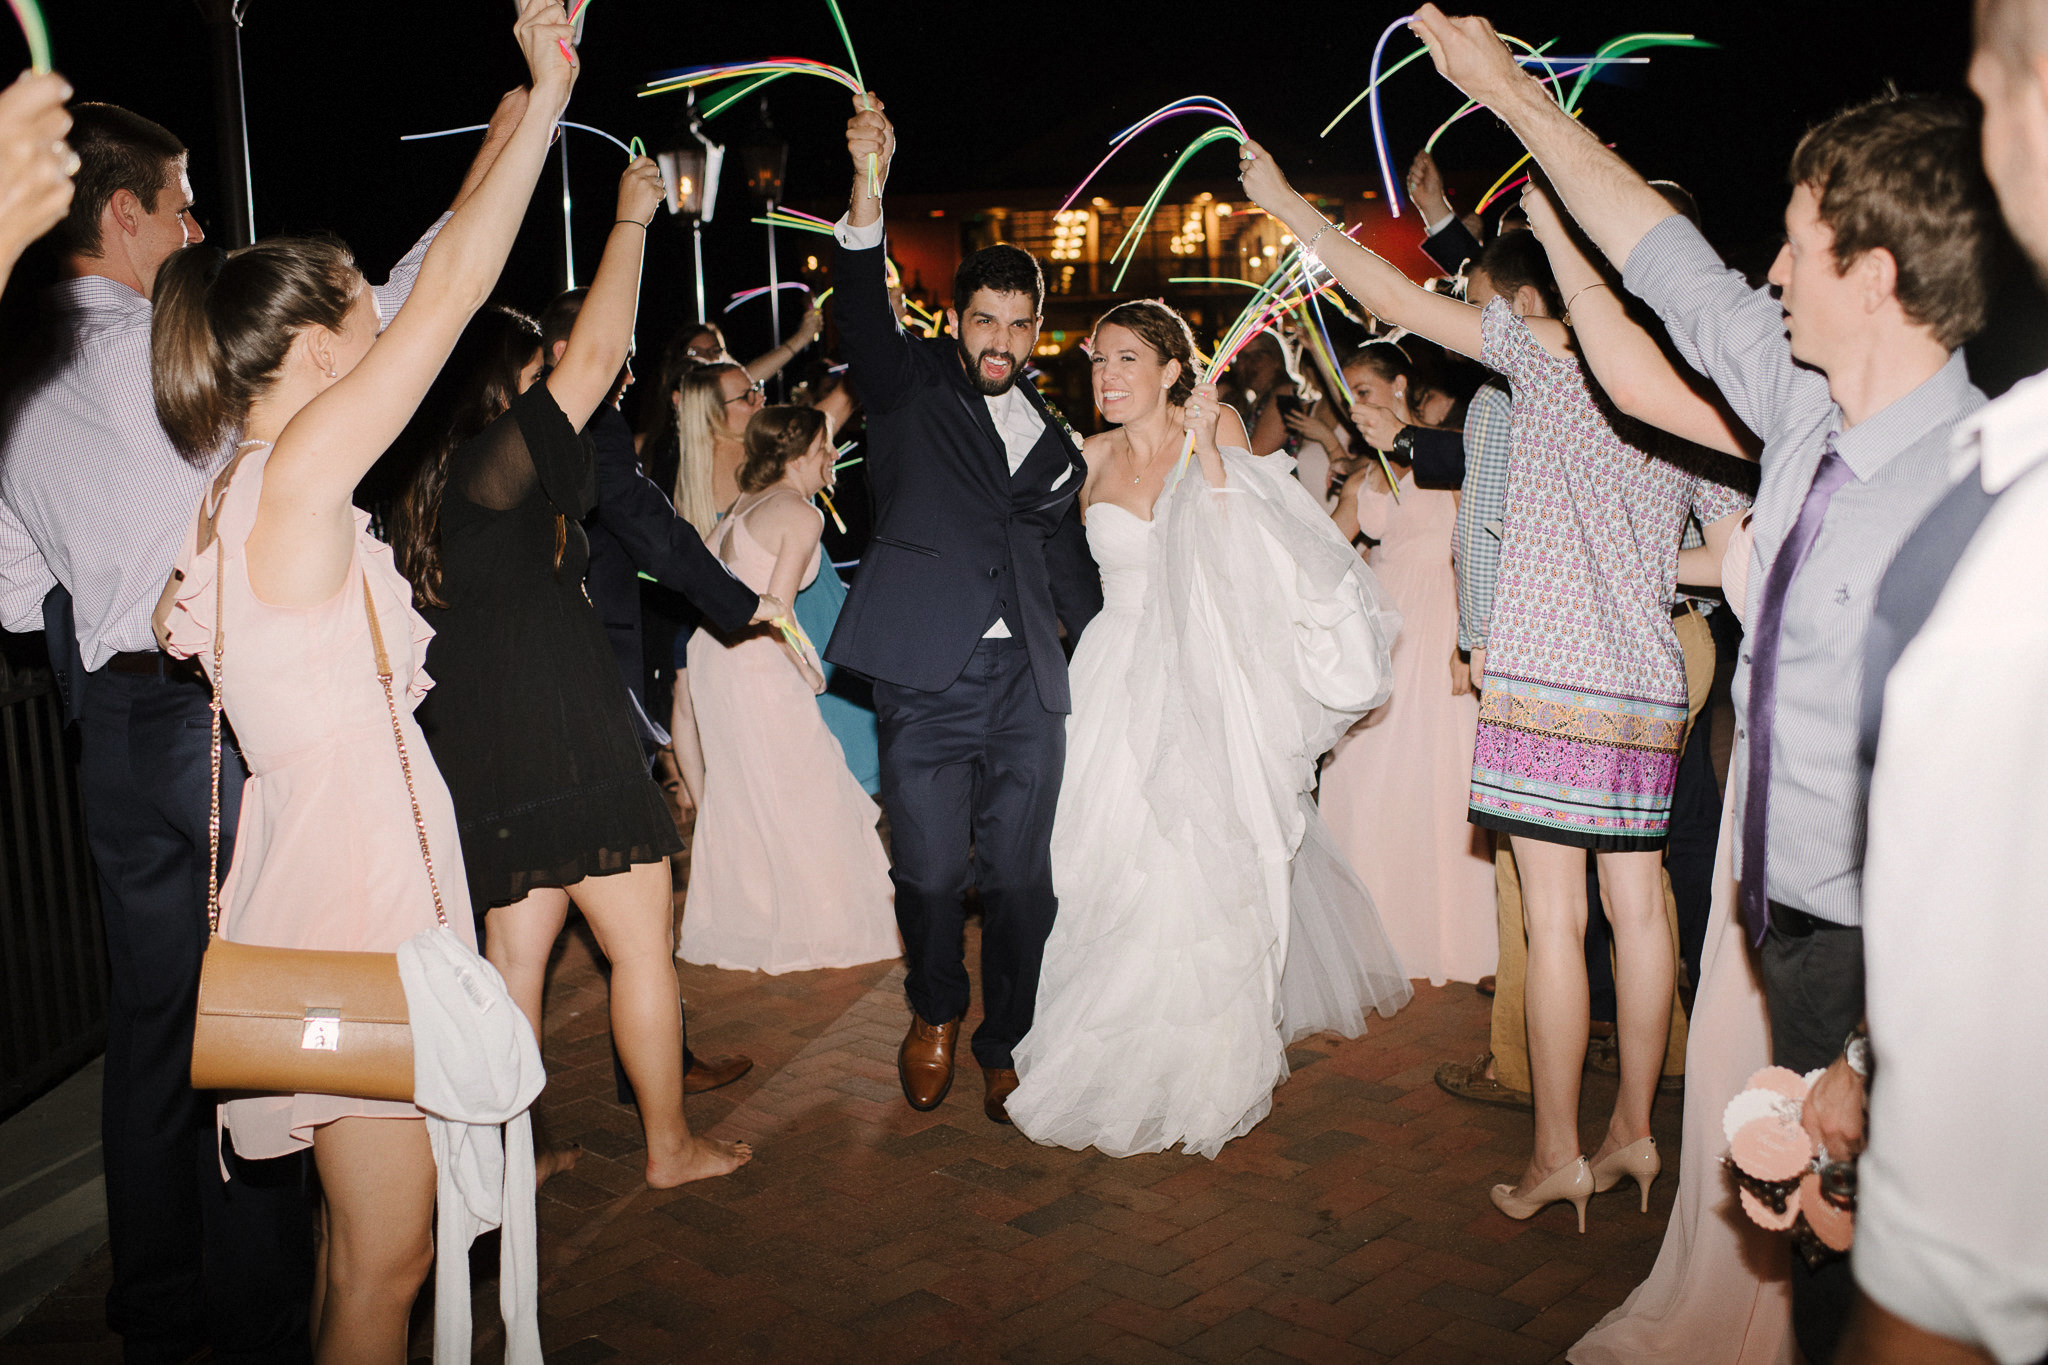 Tavares+Pavilion+on+the+Lake+Wedding+Florida_047.jpg